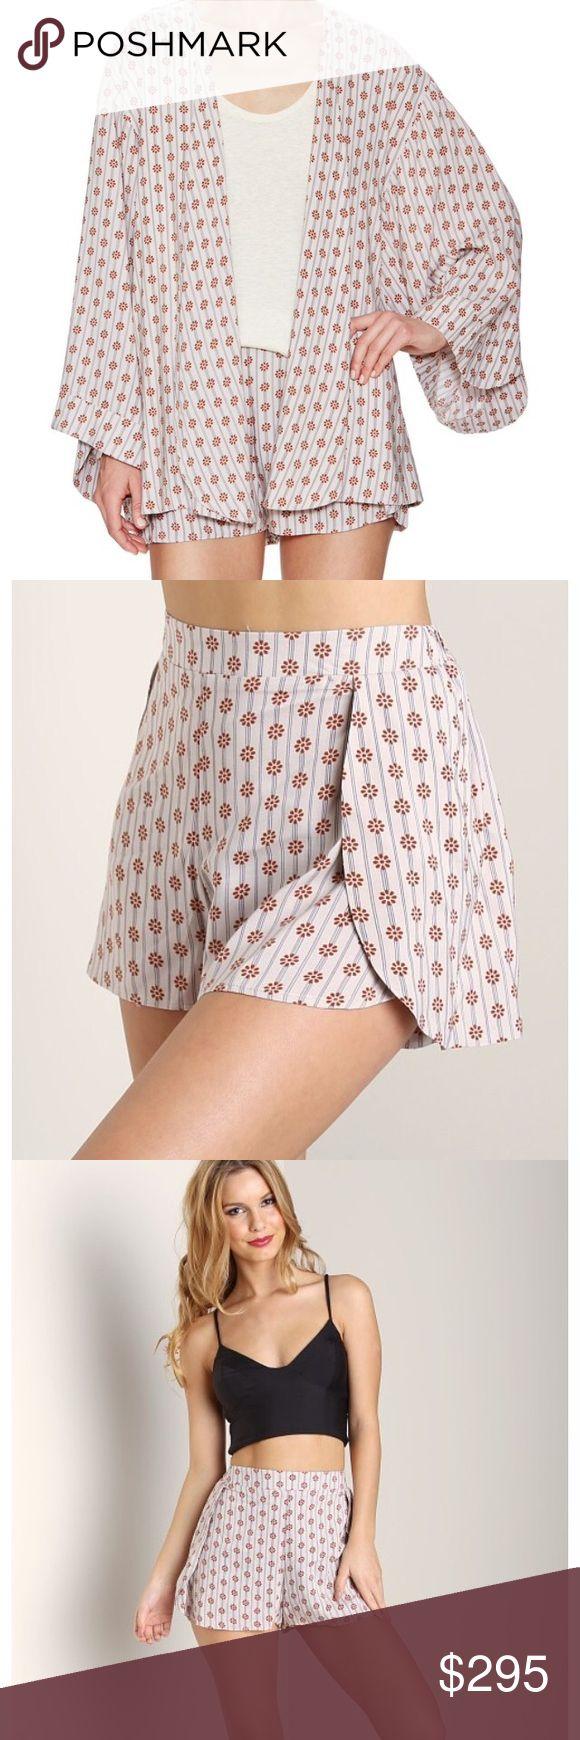 "Tori Praver Zanja Kimono & Boise Shorts Beautiful set in ""superba rust"" from the Tori Praver swimsuit collection. Never worn. New with tags. Size 2. Tori Praver Swimwear Swim Coverups"